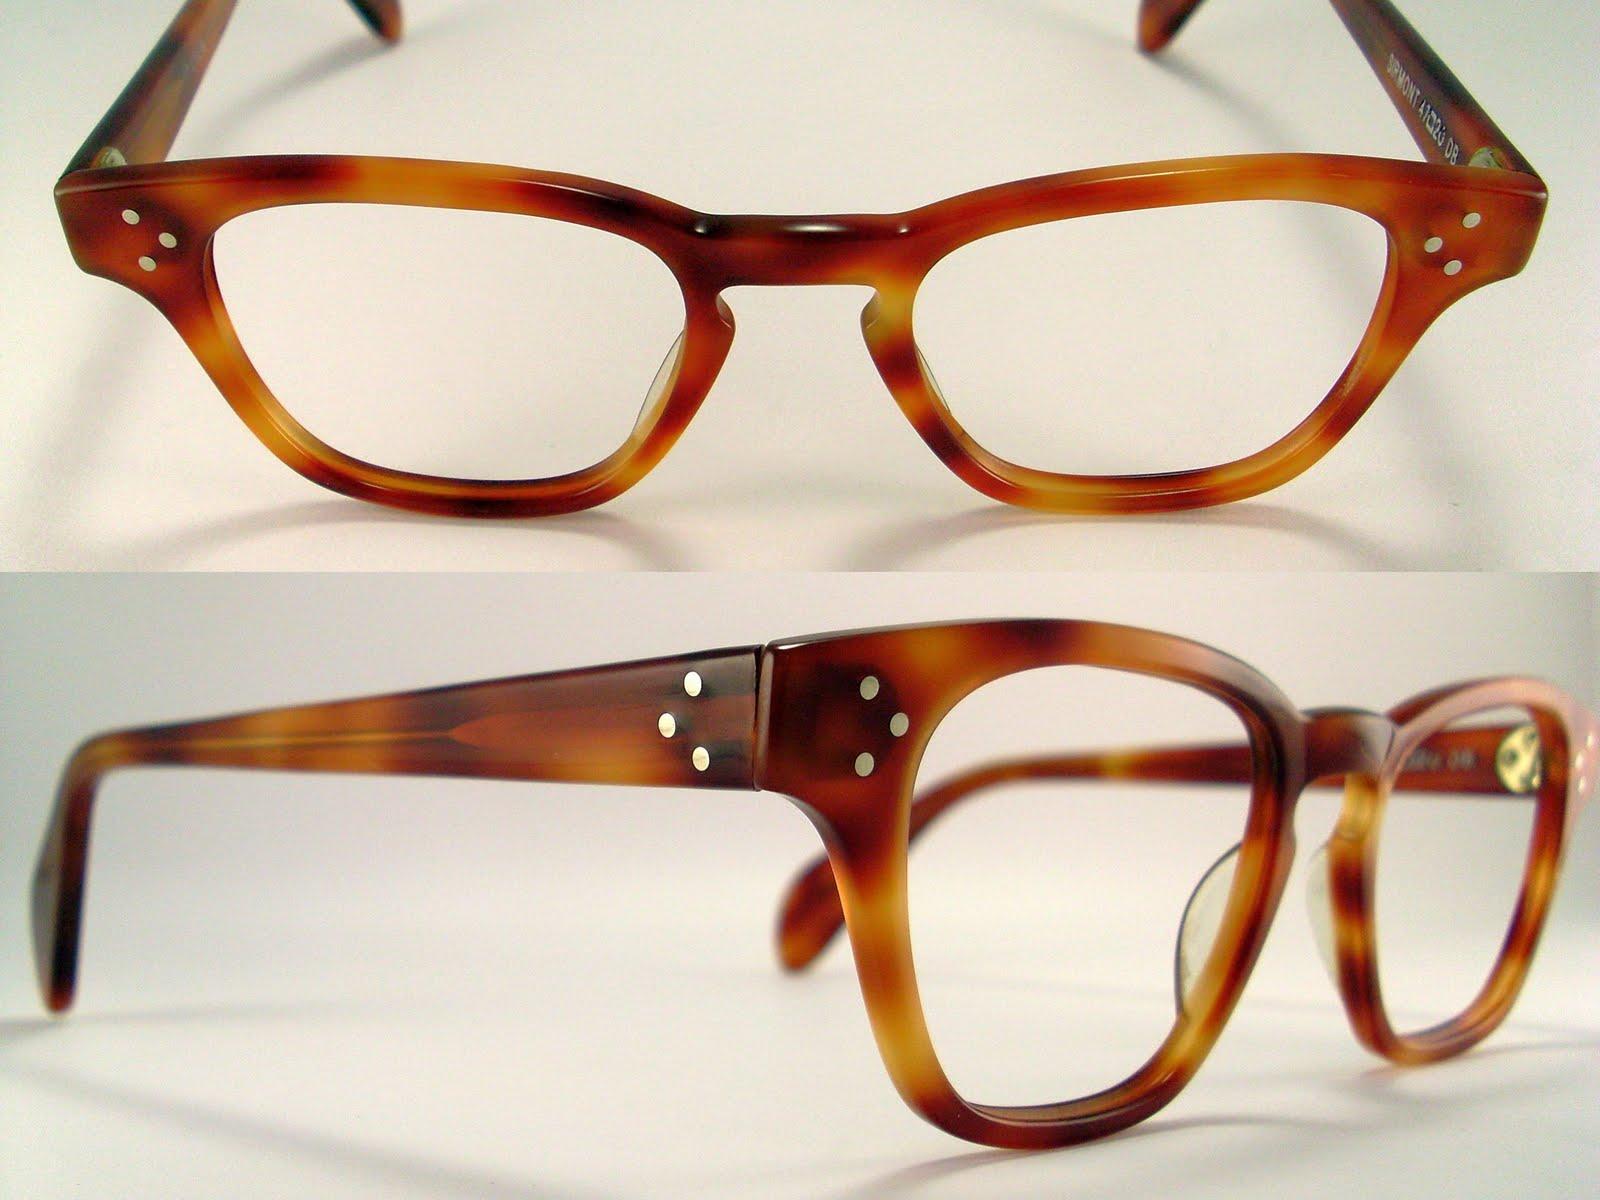 Glasses Frames Used : Vintage Eyeglasses Frames Eyewear Sunglasses 50S: VINTAGE ...